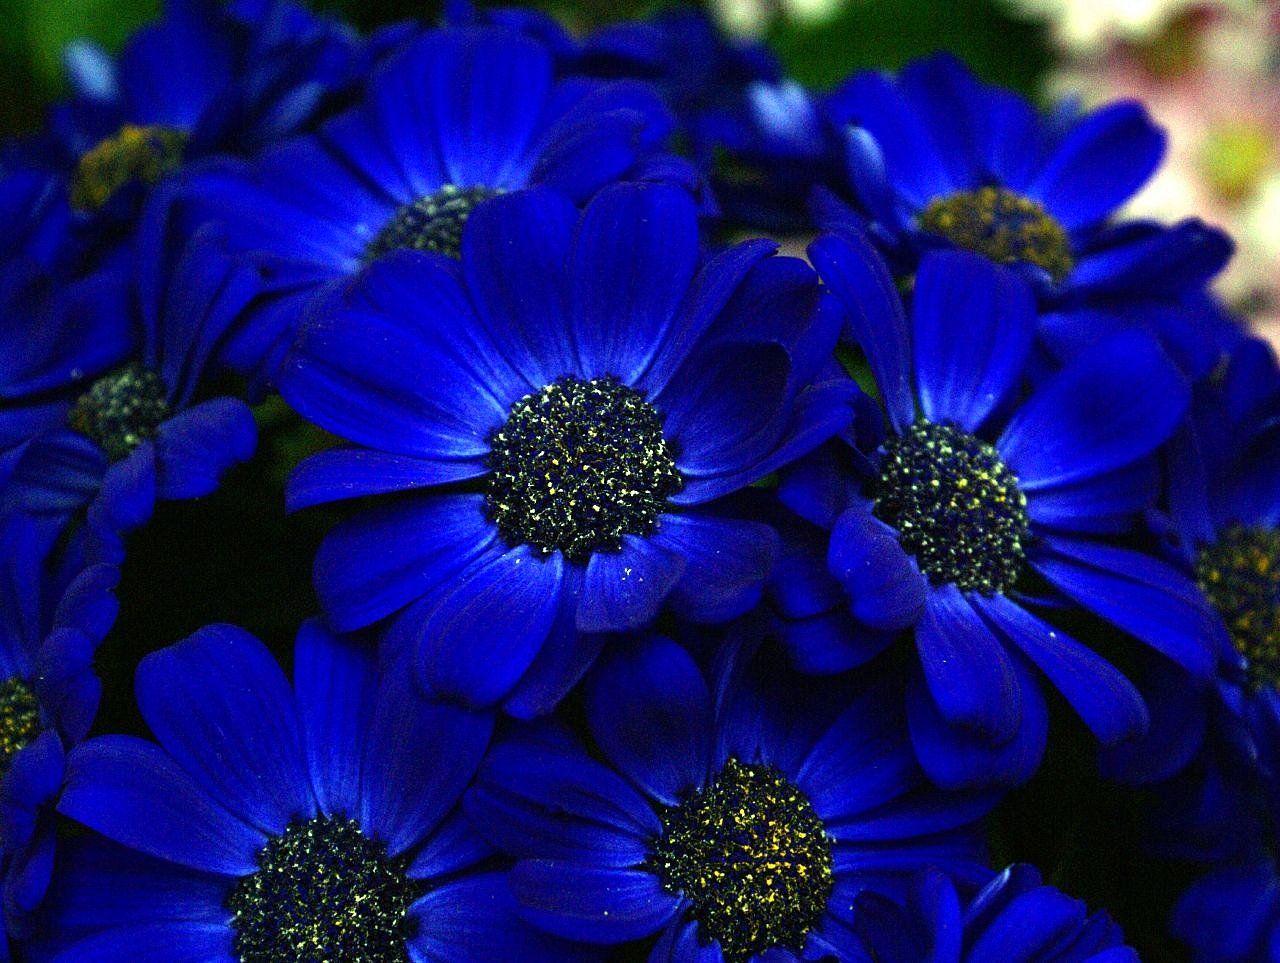 Blue flowers cineraria floral power pinterest flowers flower deep blue almost a midnight blue with dark centers izmirmasajfo